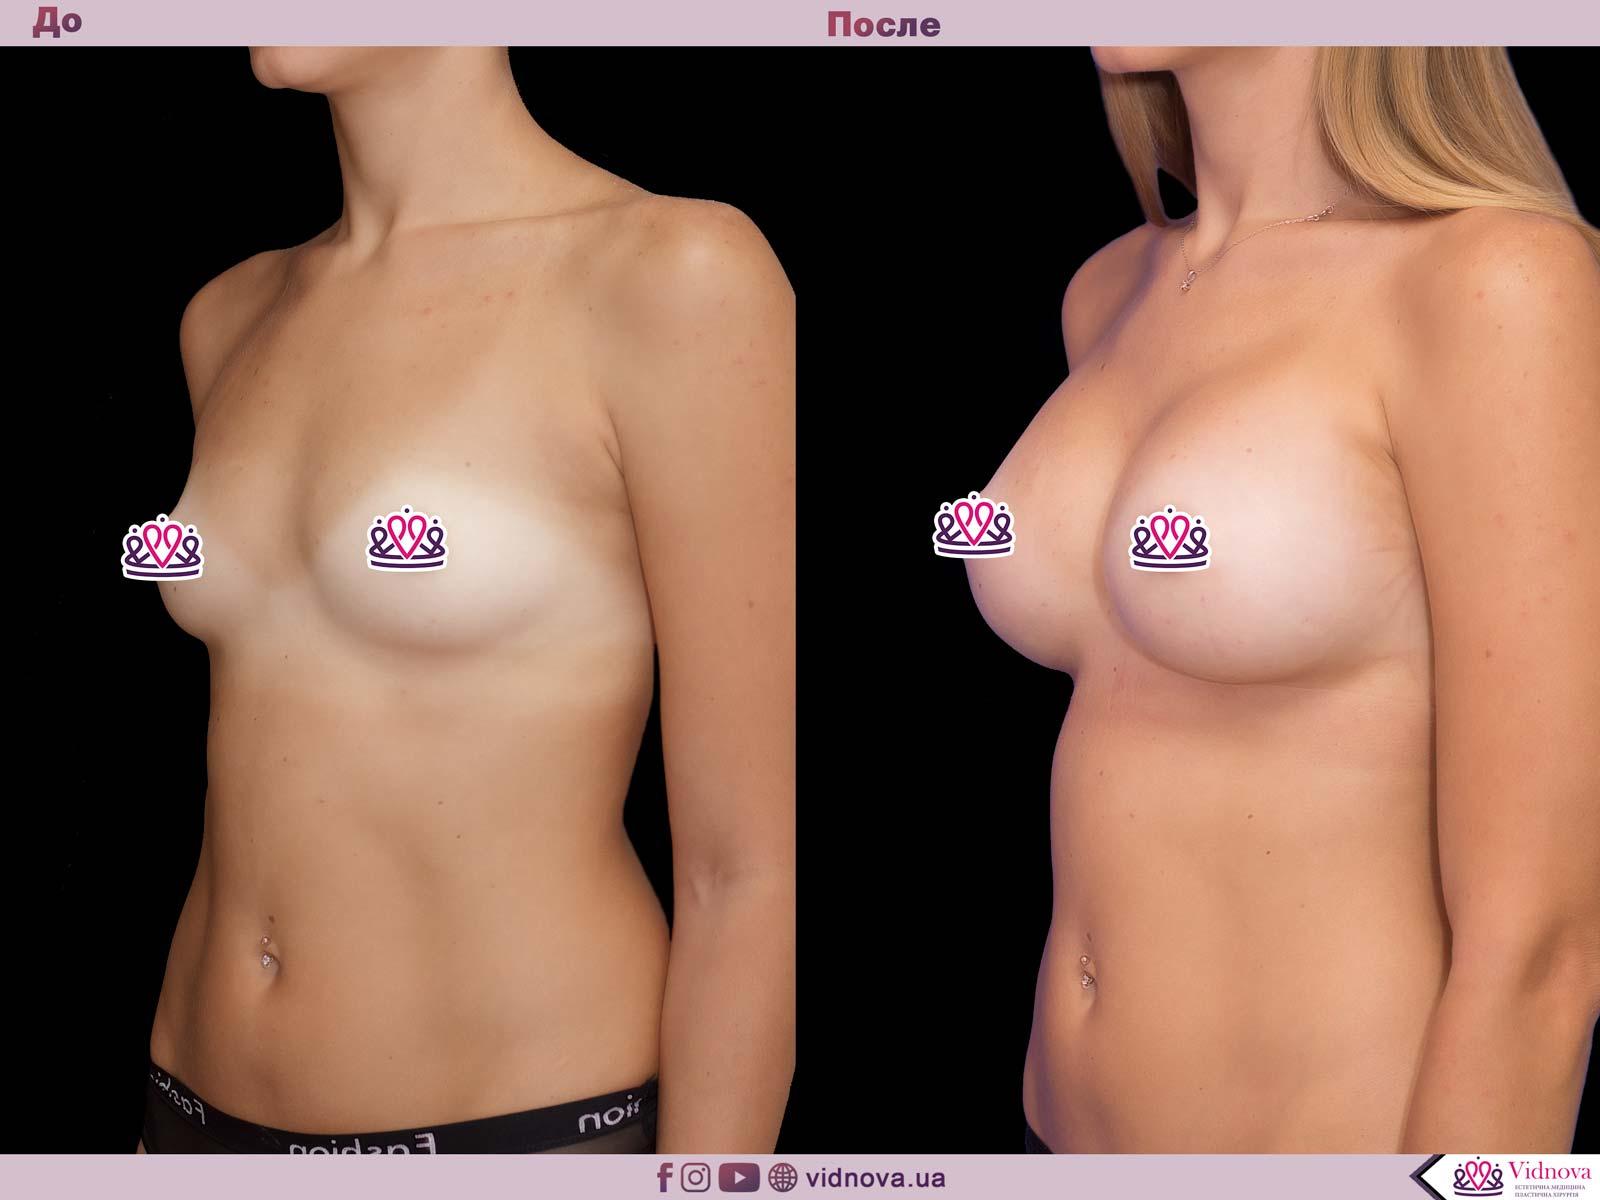 Увеличение груди: Фото ДО и ПОСЛЕ - Пример №50-2 - Клиника Vidnova